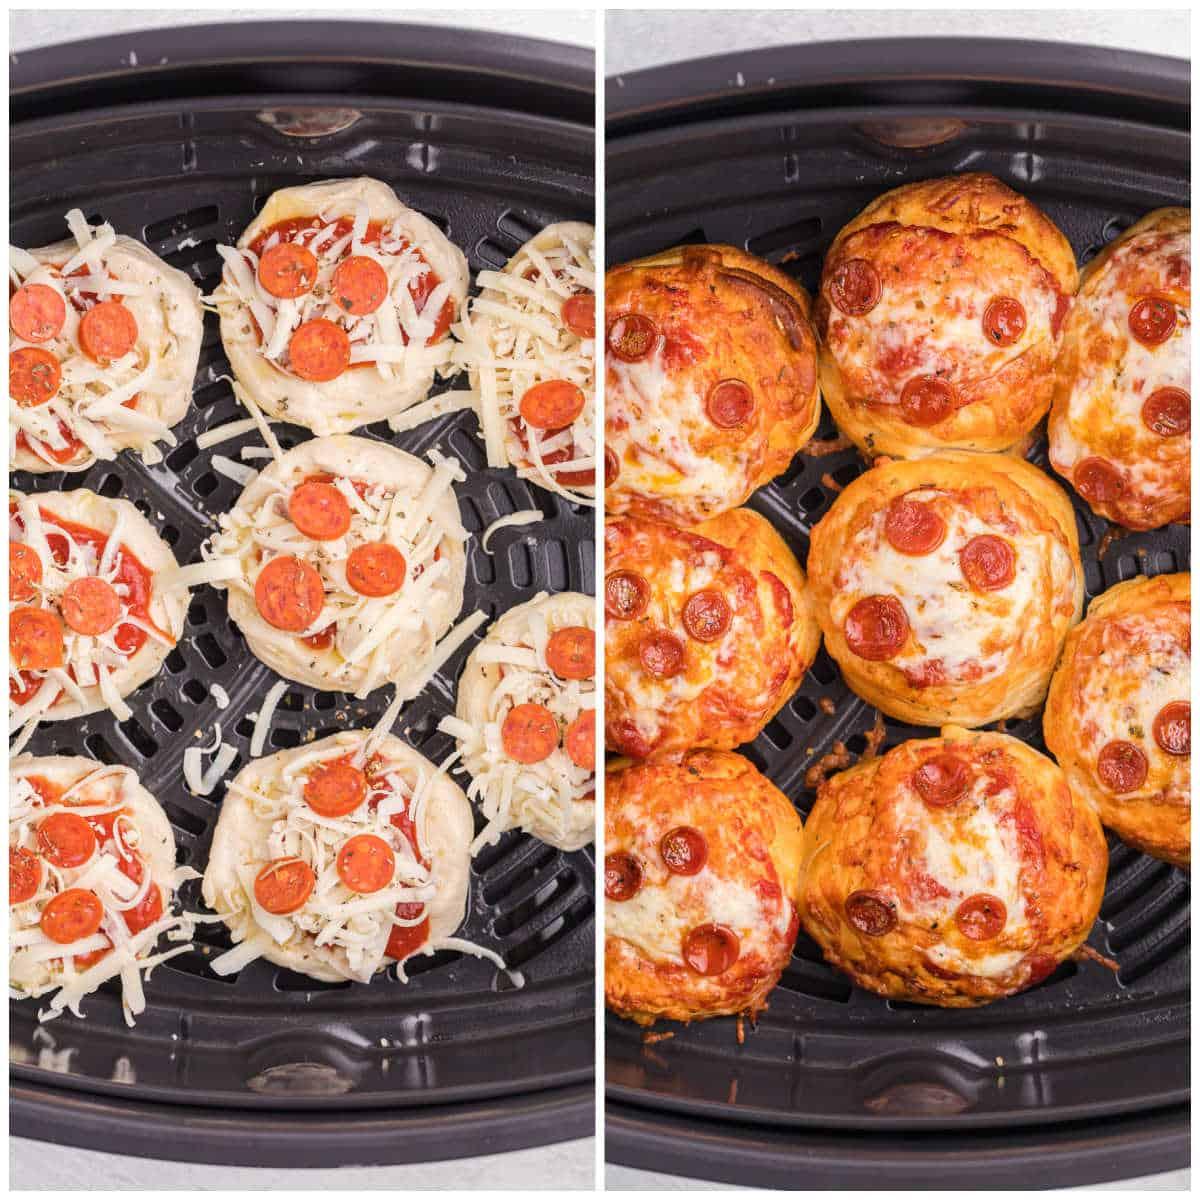 Air Fryer Pizza Buns being prepared in an air fryer basket.